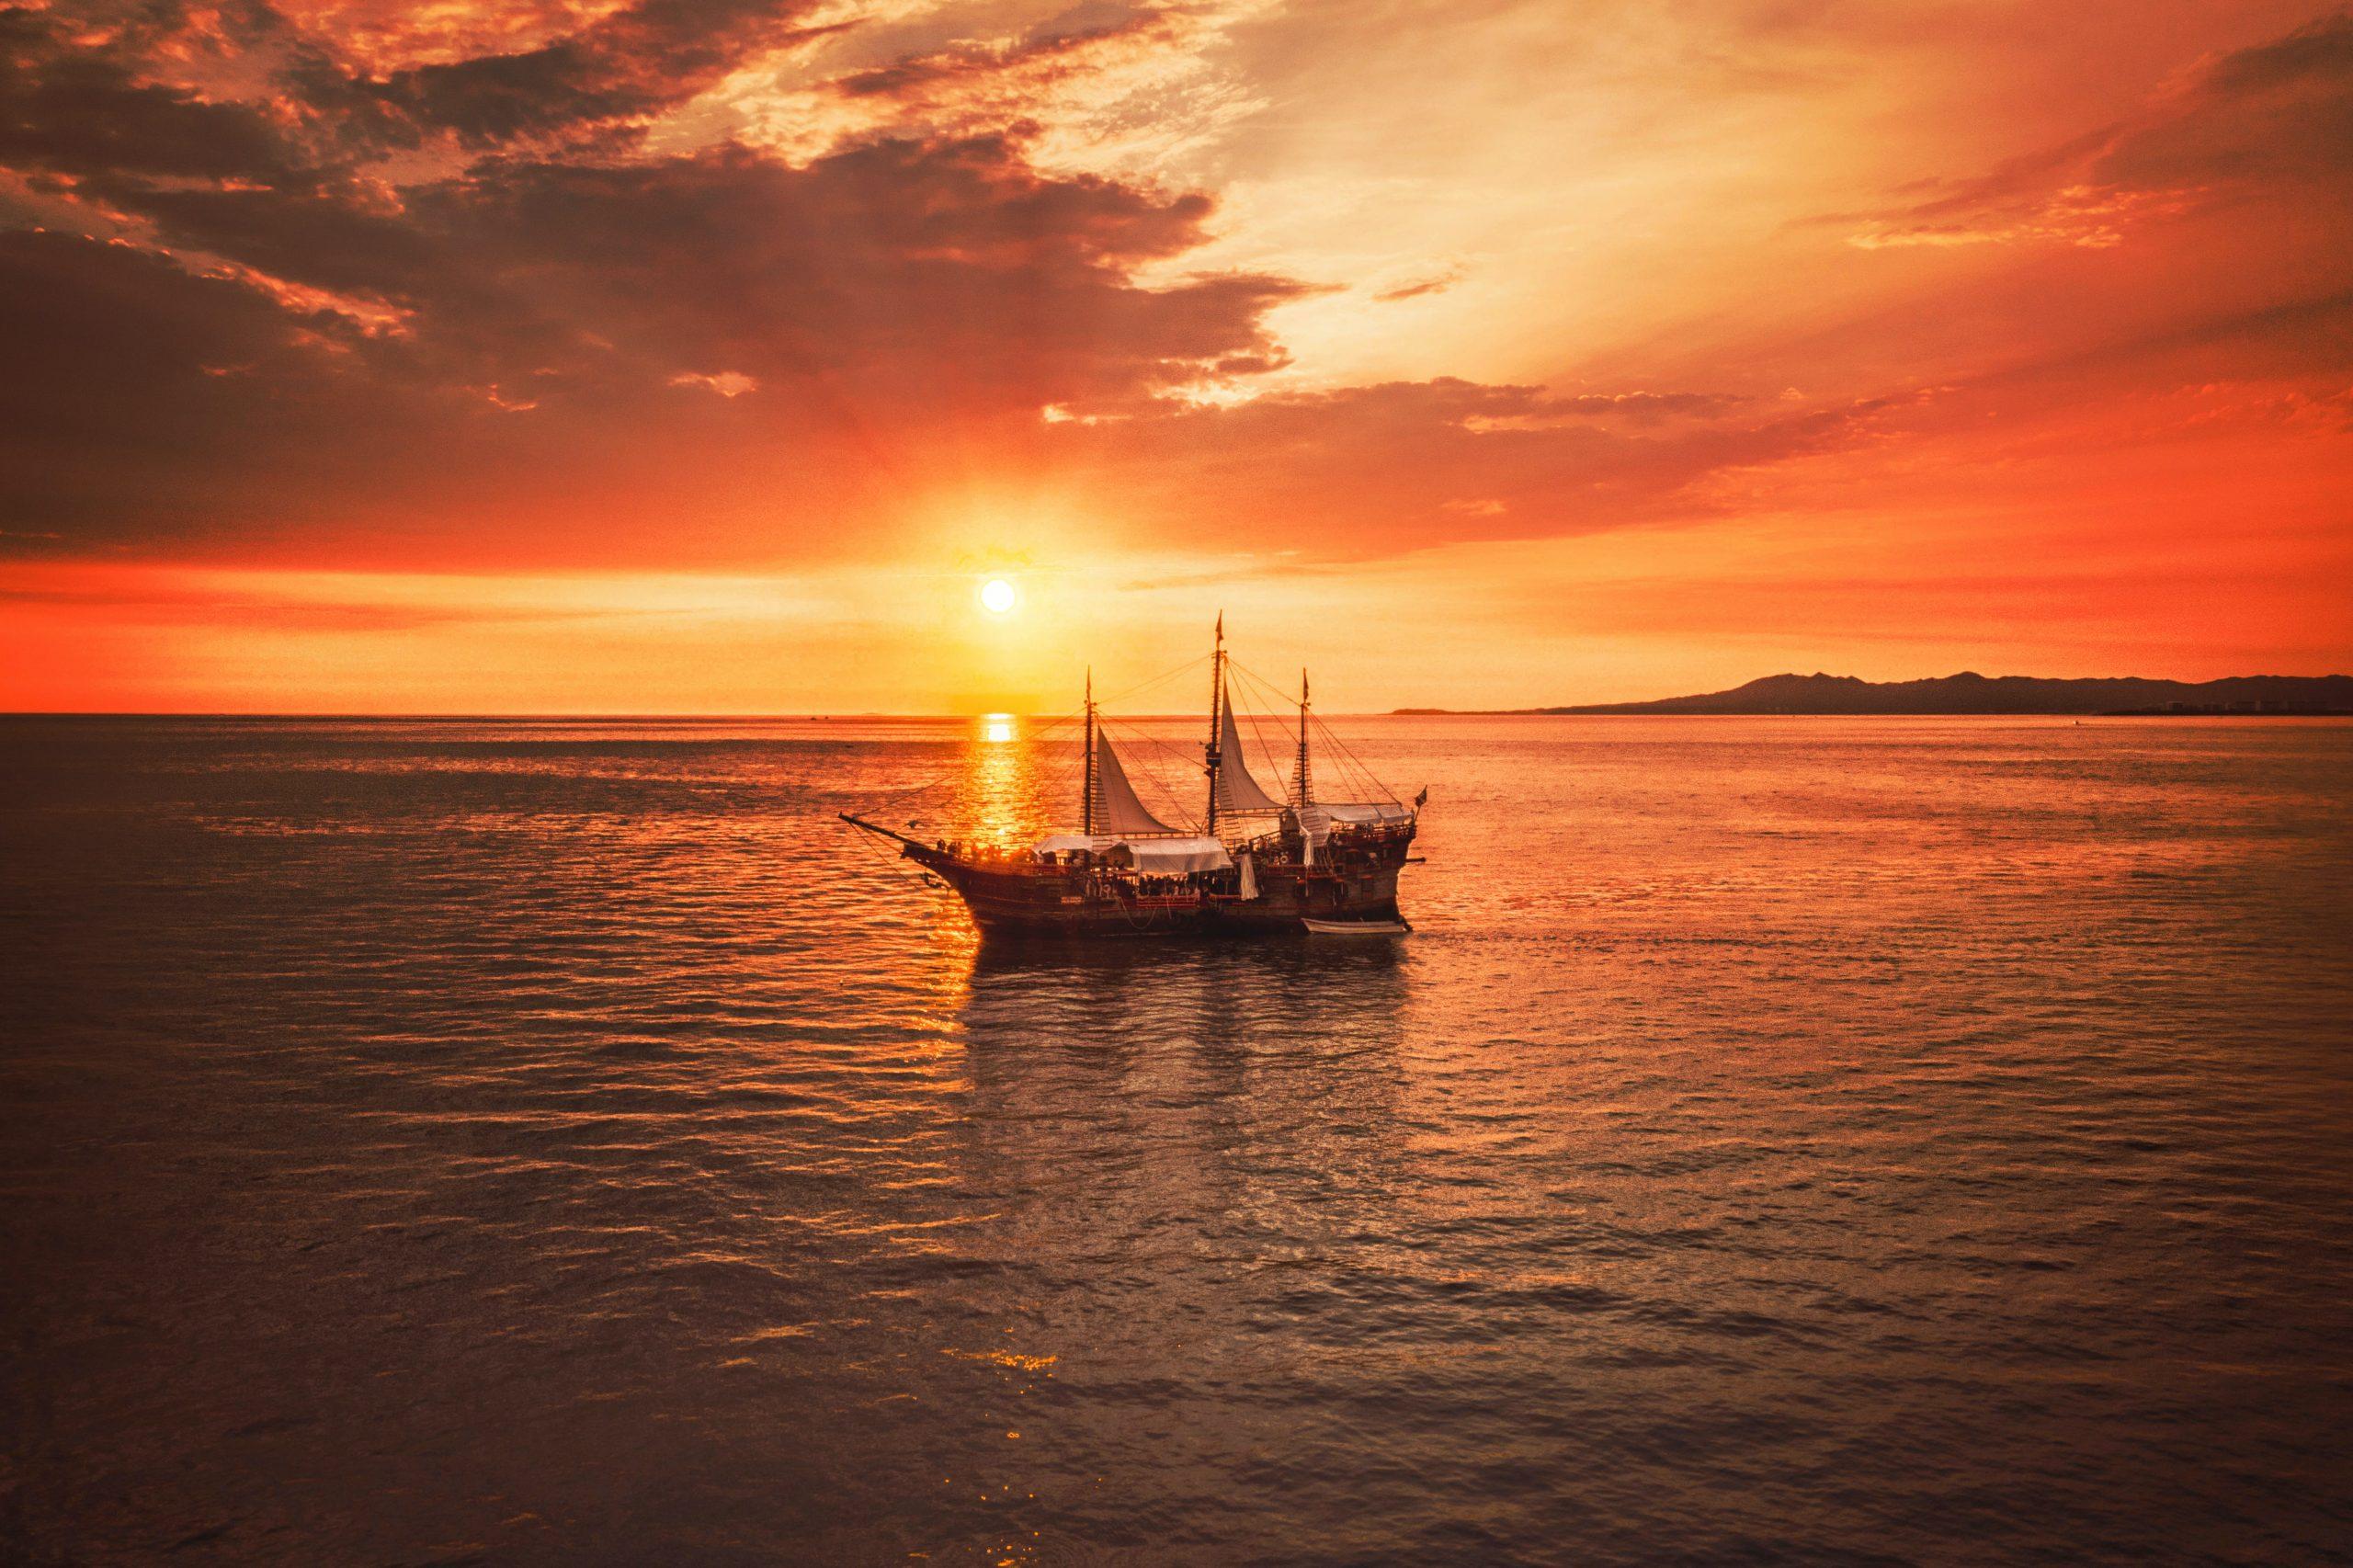 Marigalante Pirate Boat By Alonso Reyes [unsplash]